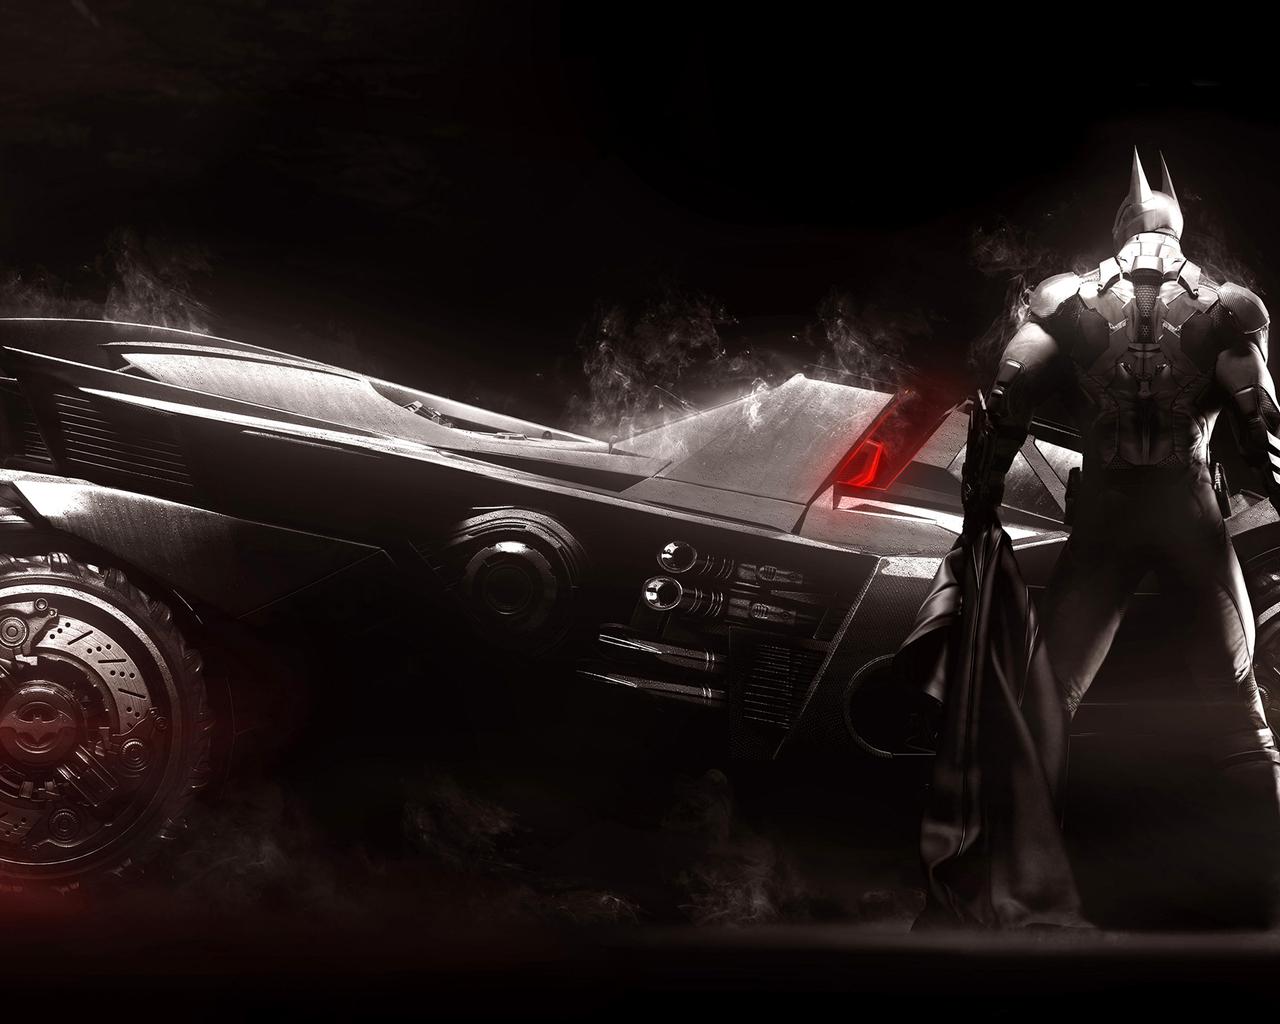 batmobile-batman-arkham-knight-artwork-qhd.jpg